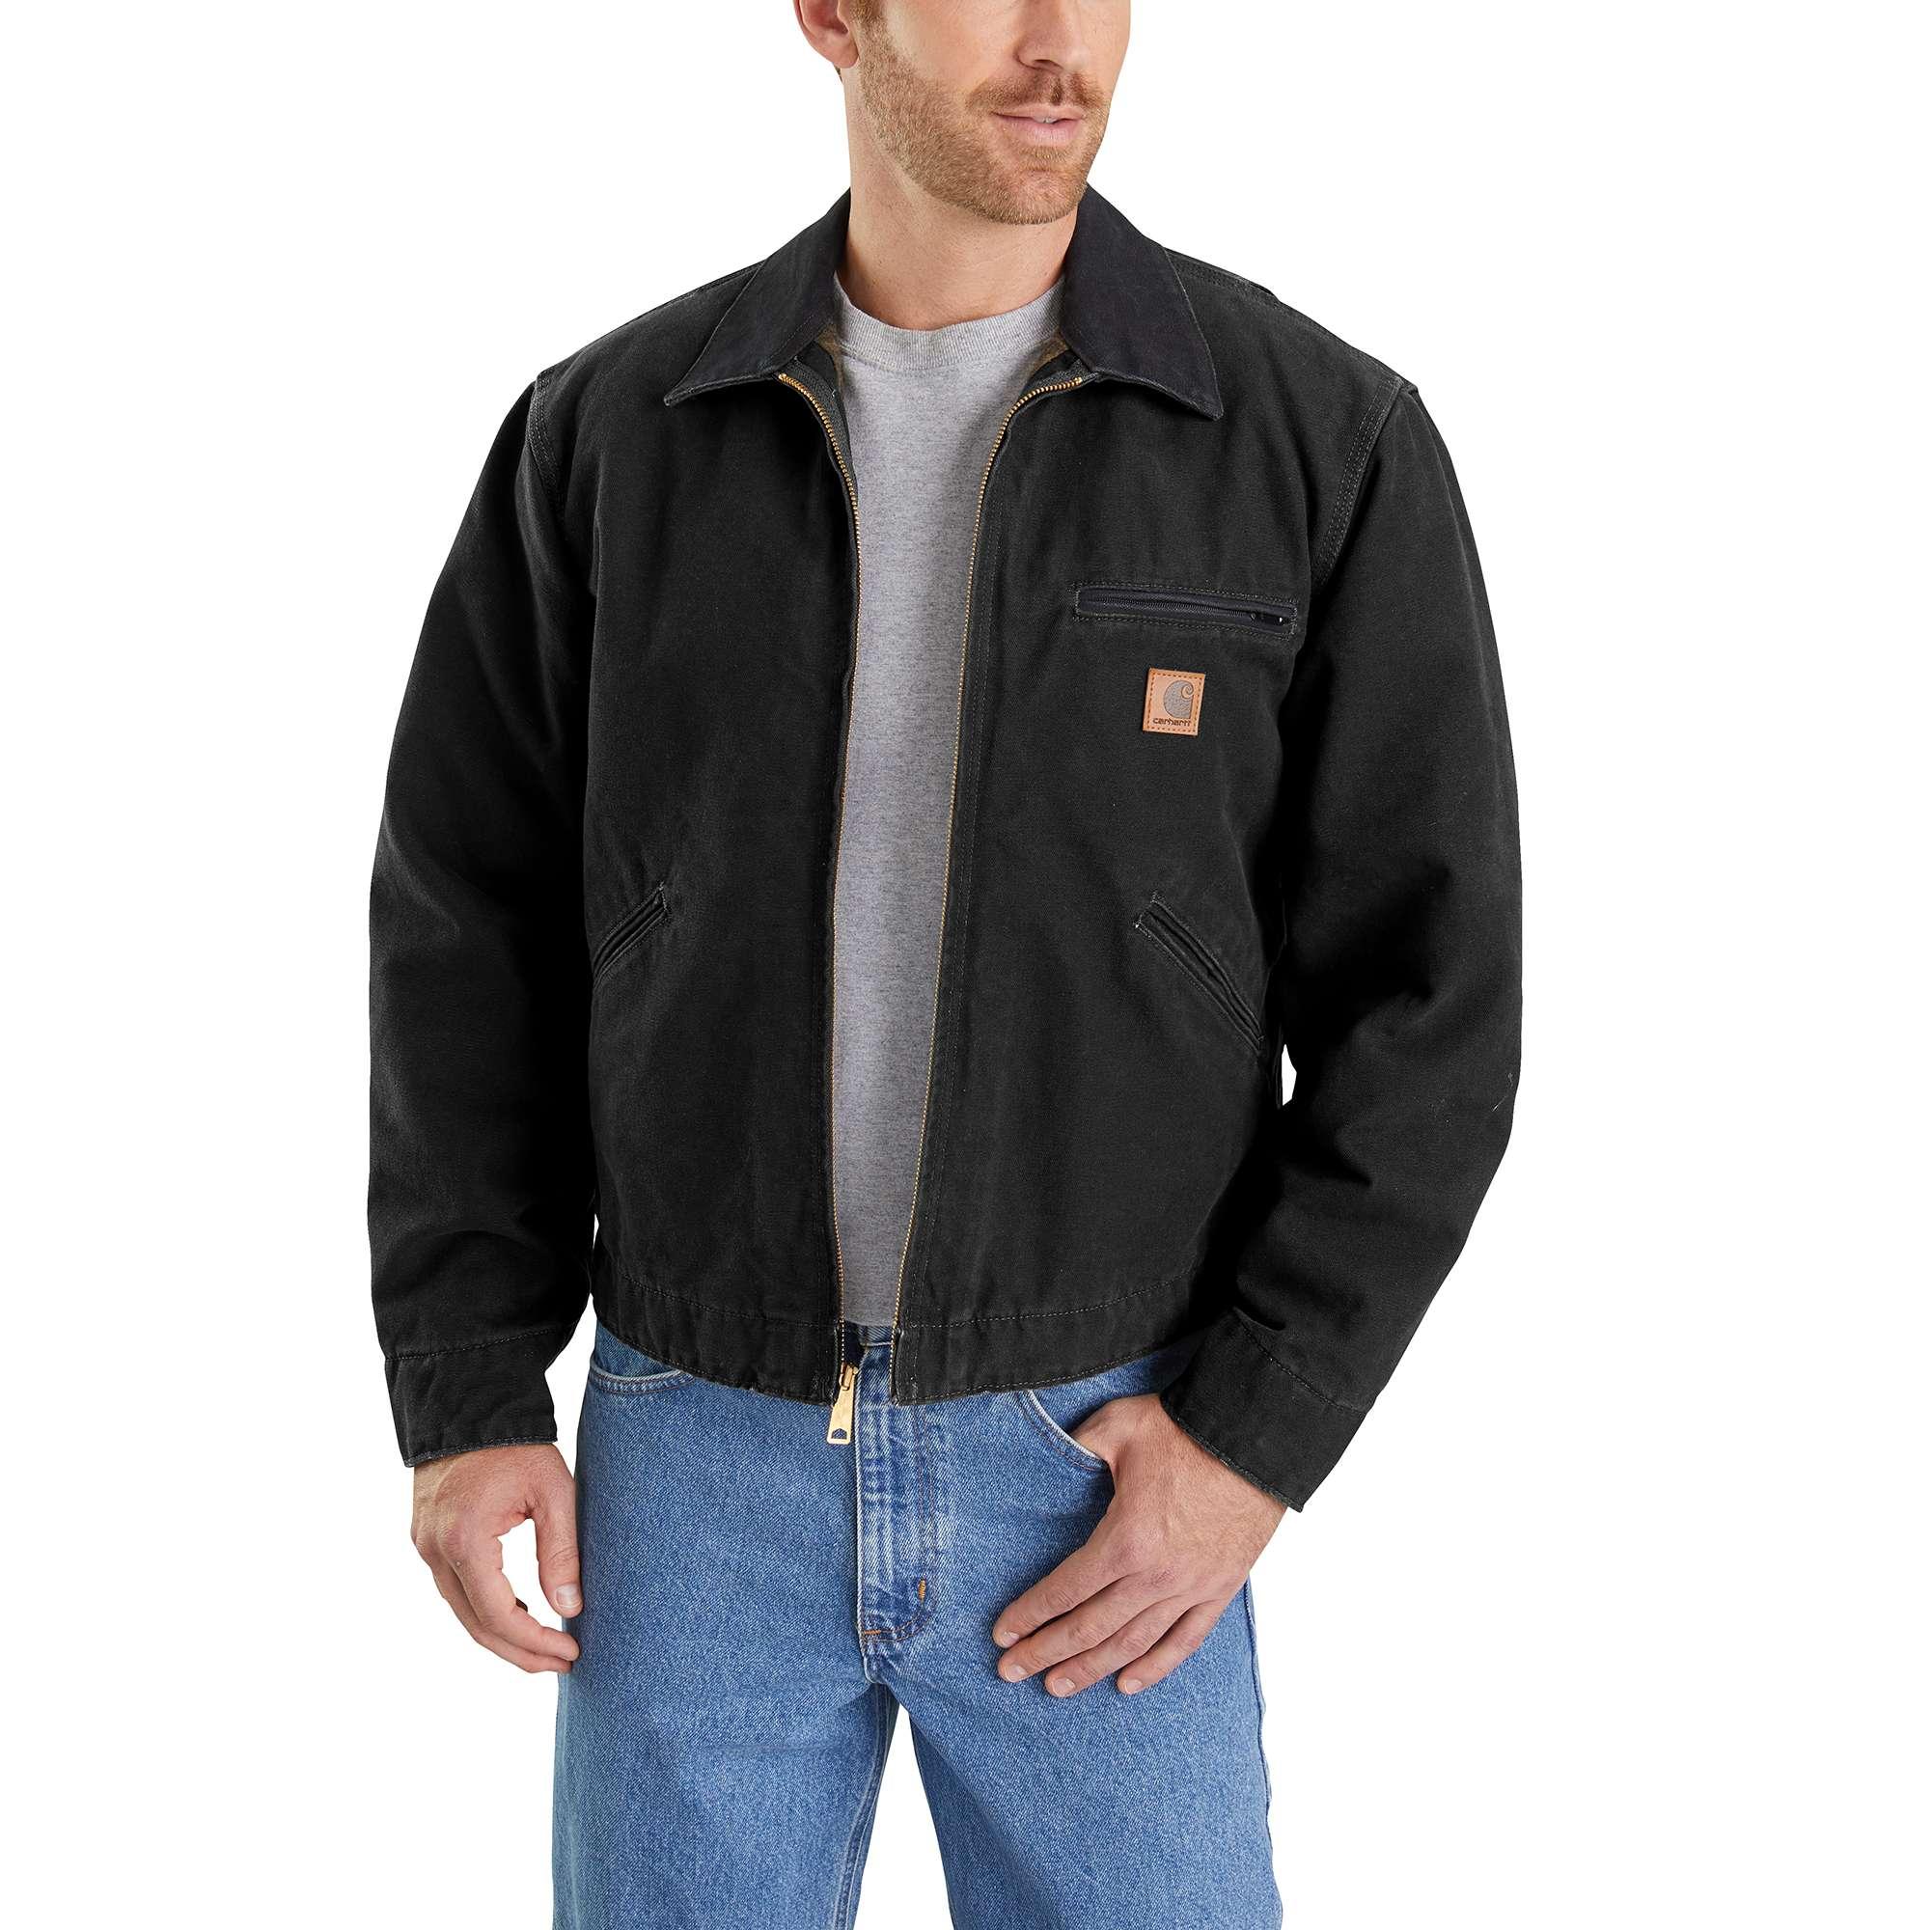 Carhartt Sandstone Detroit Jacket / Blanket Lined